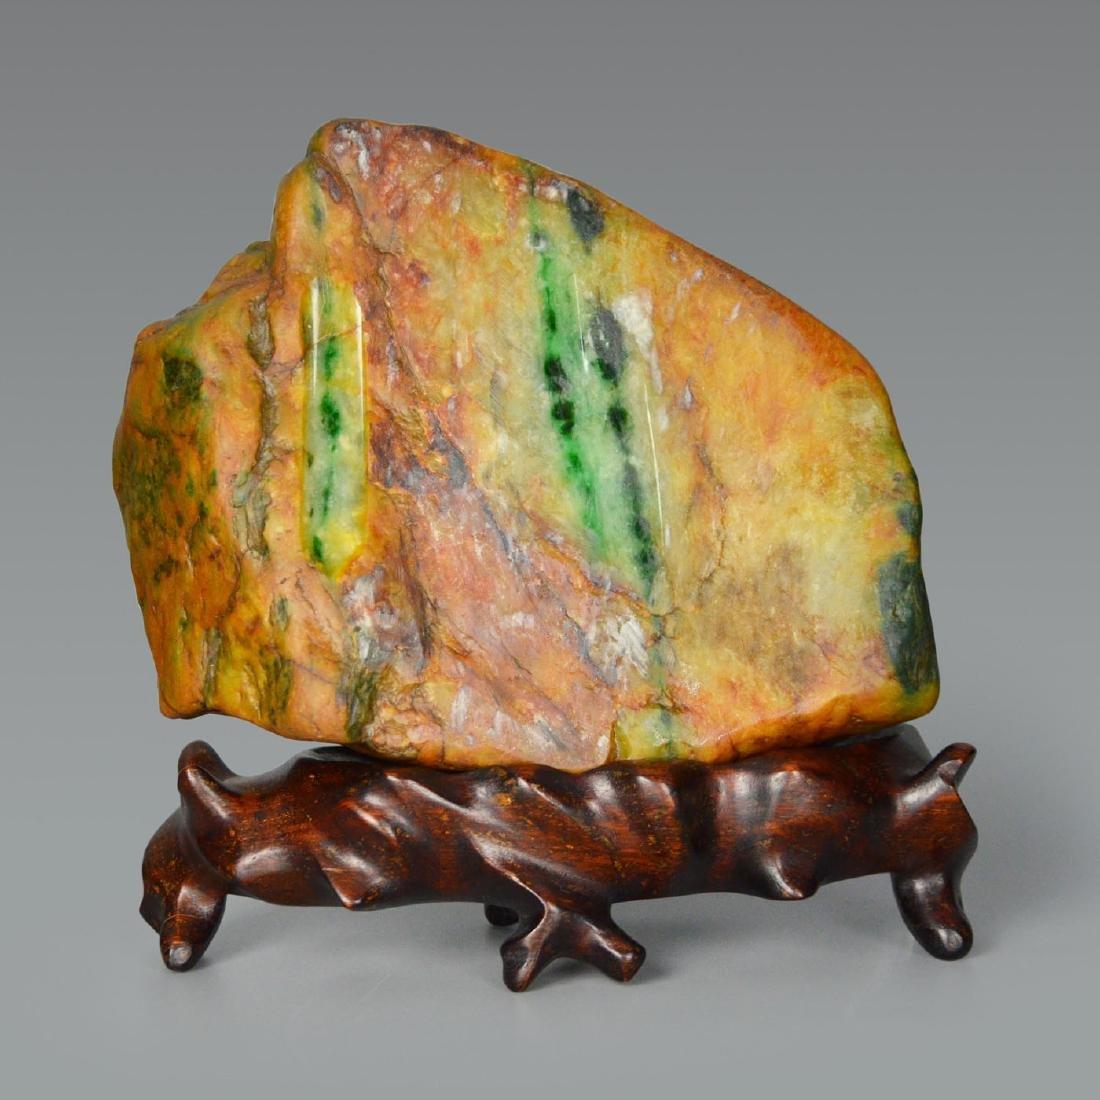 A Fine Scholars' Desk Russet Jadeite Boulder with Stand